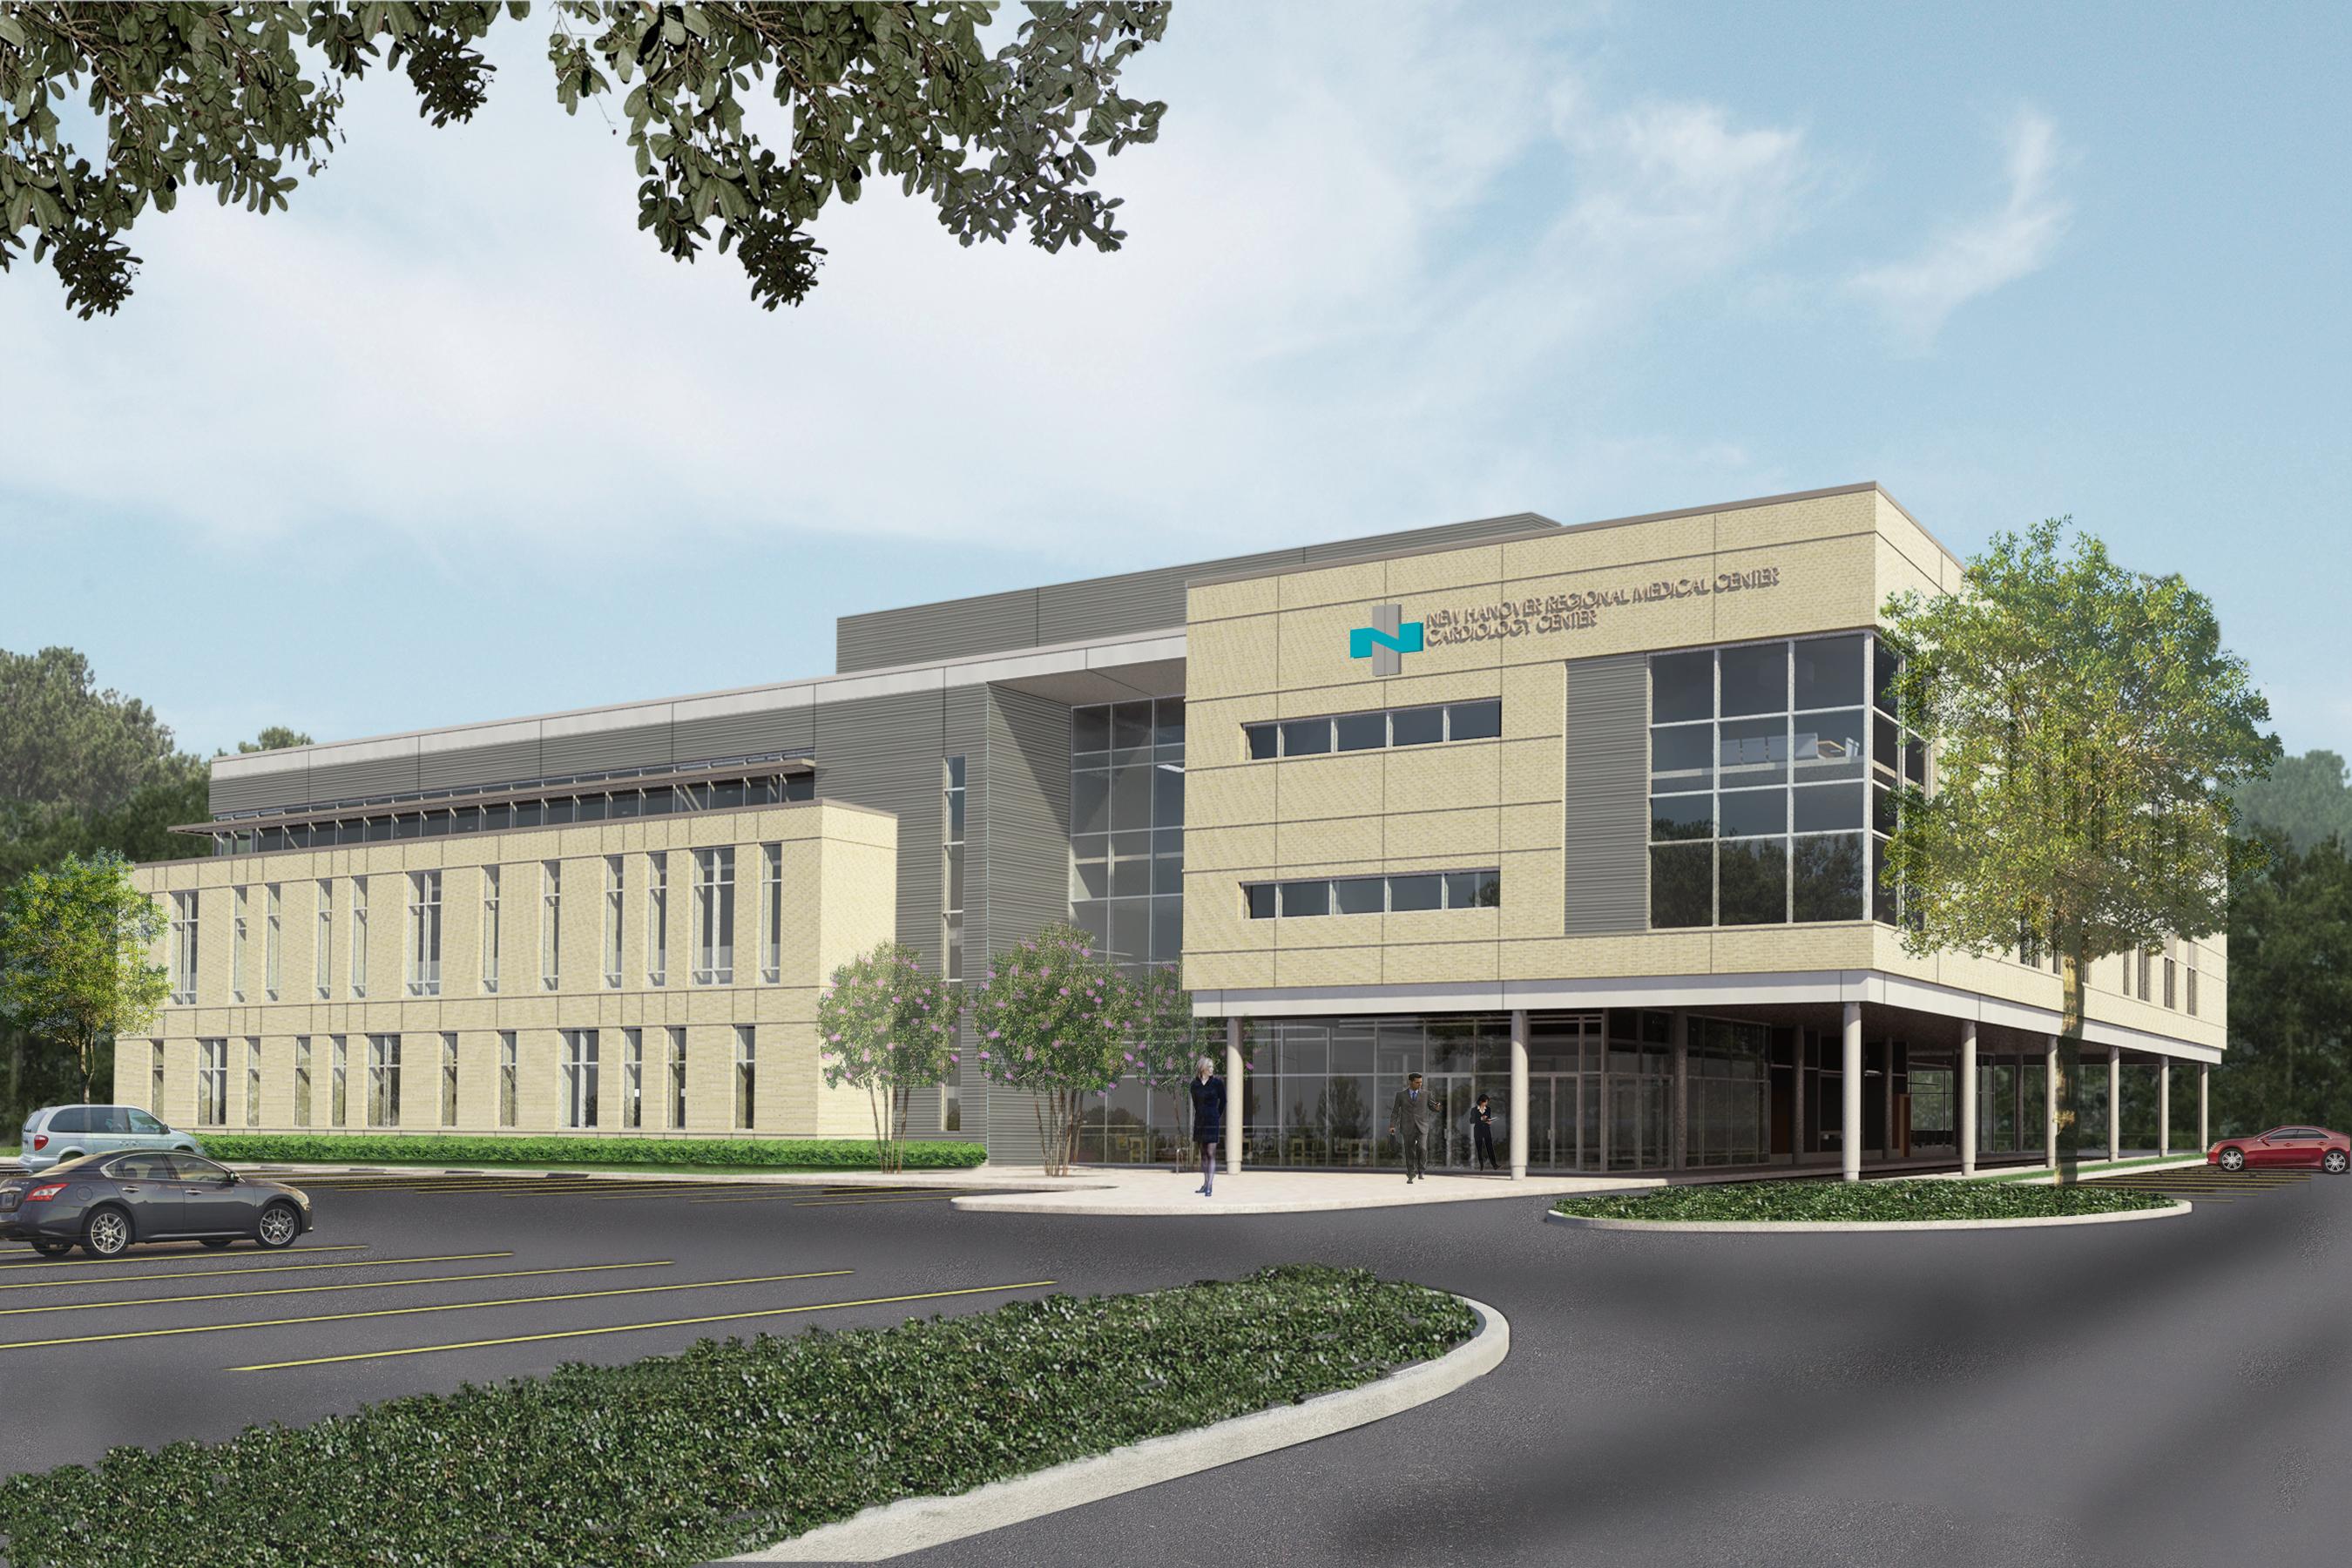 New Nhrmc Clinic To Break Ground This Summer Wilmingtonbiz